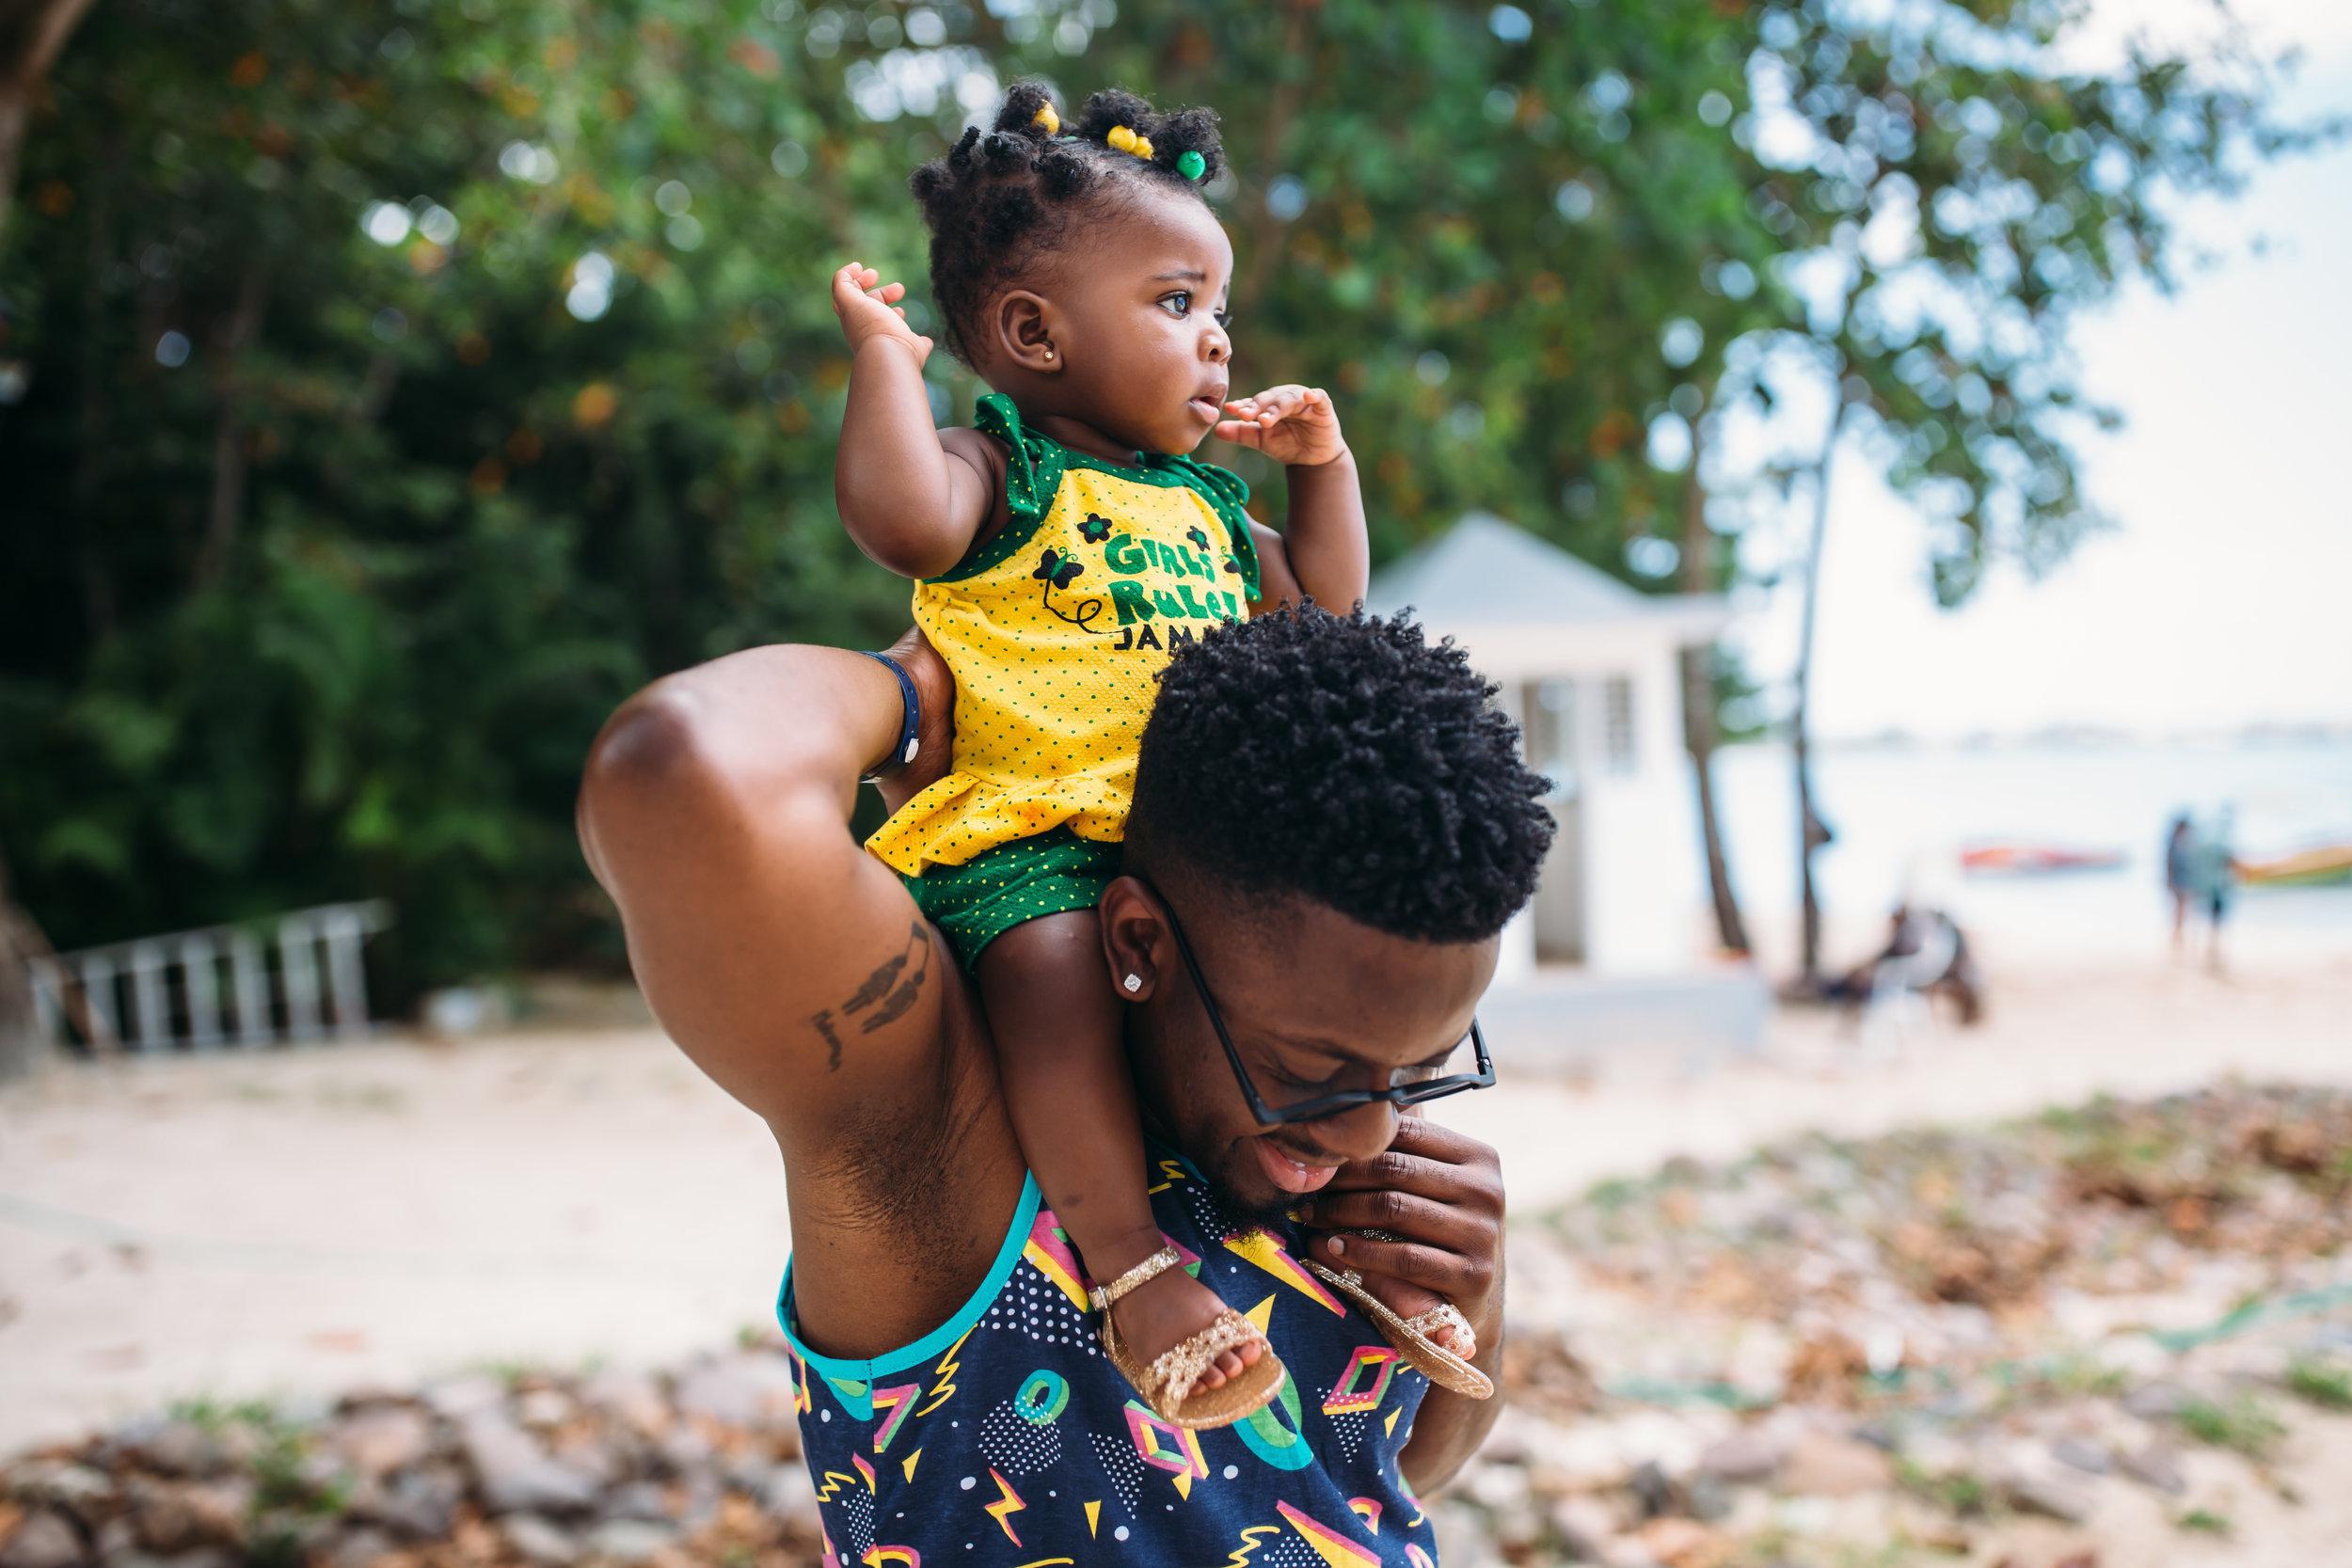 Jamaica_Family_61719-19.jpg